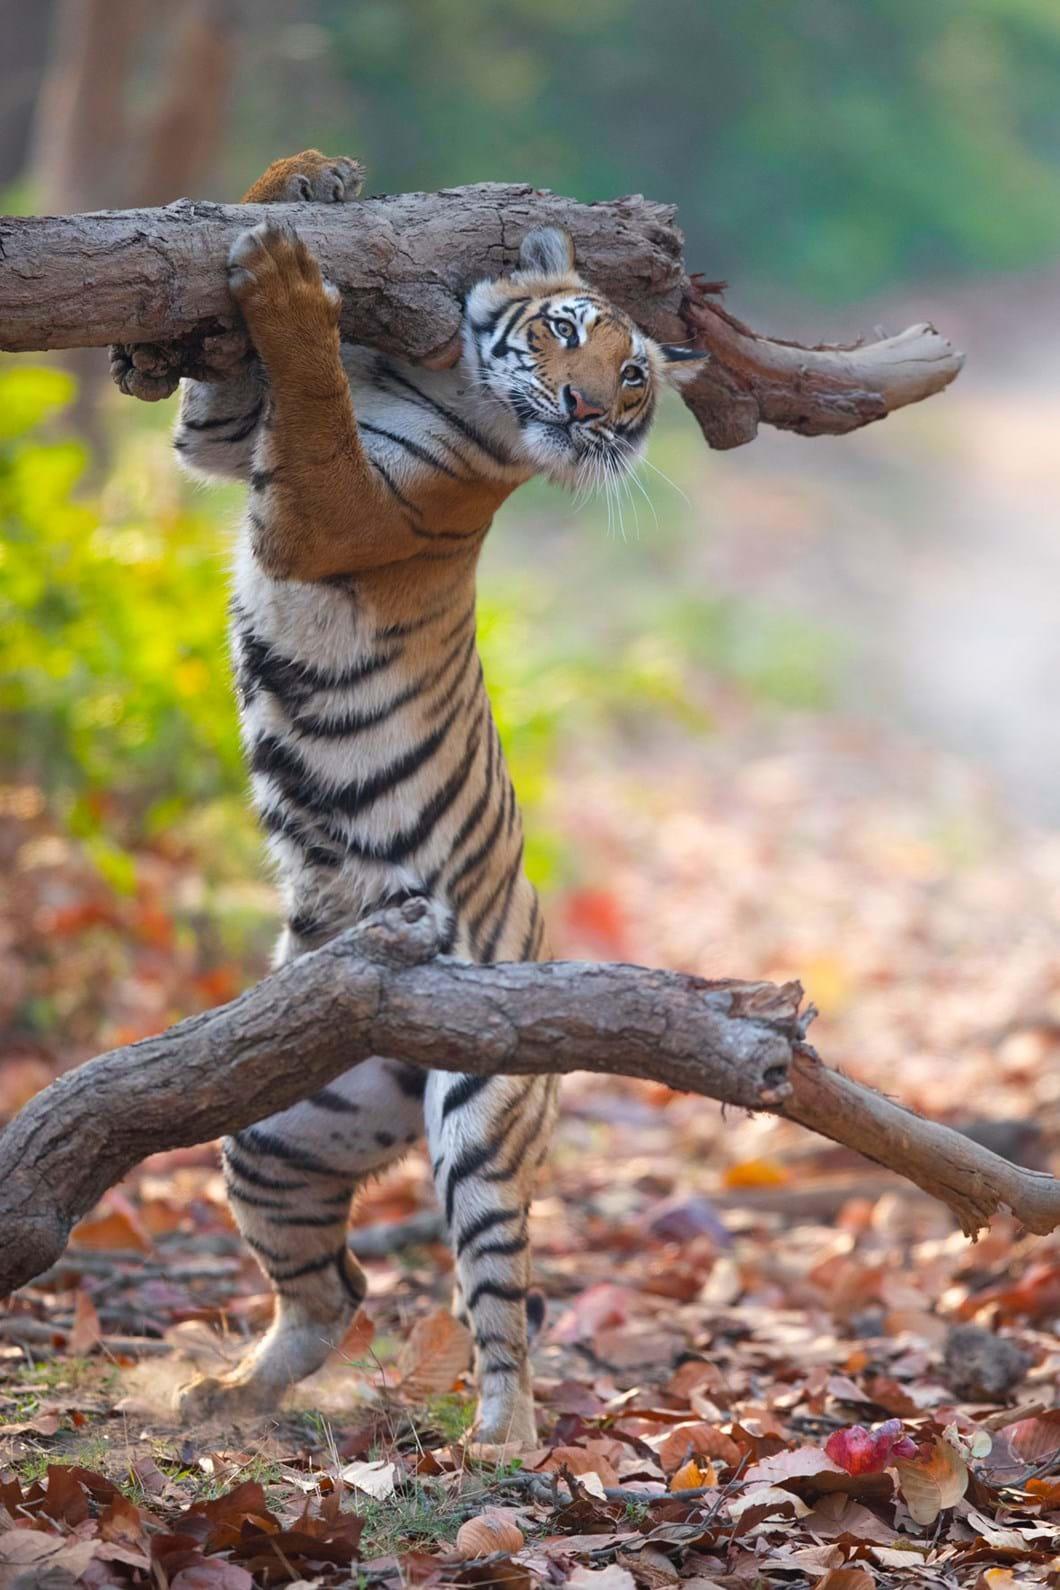 Siddhant-Agrawal-tiger_2021-09-02.jpg